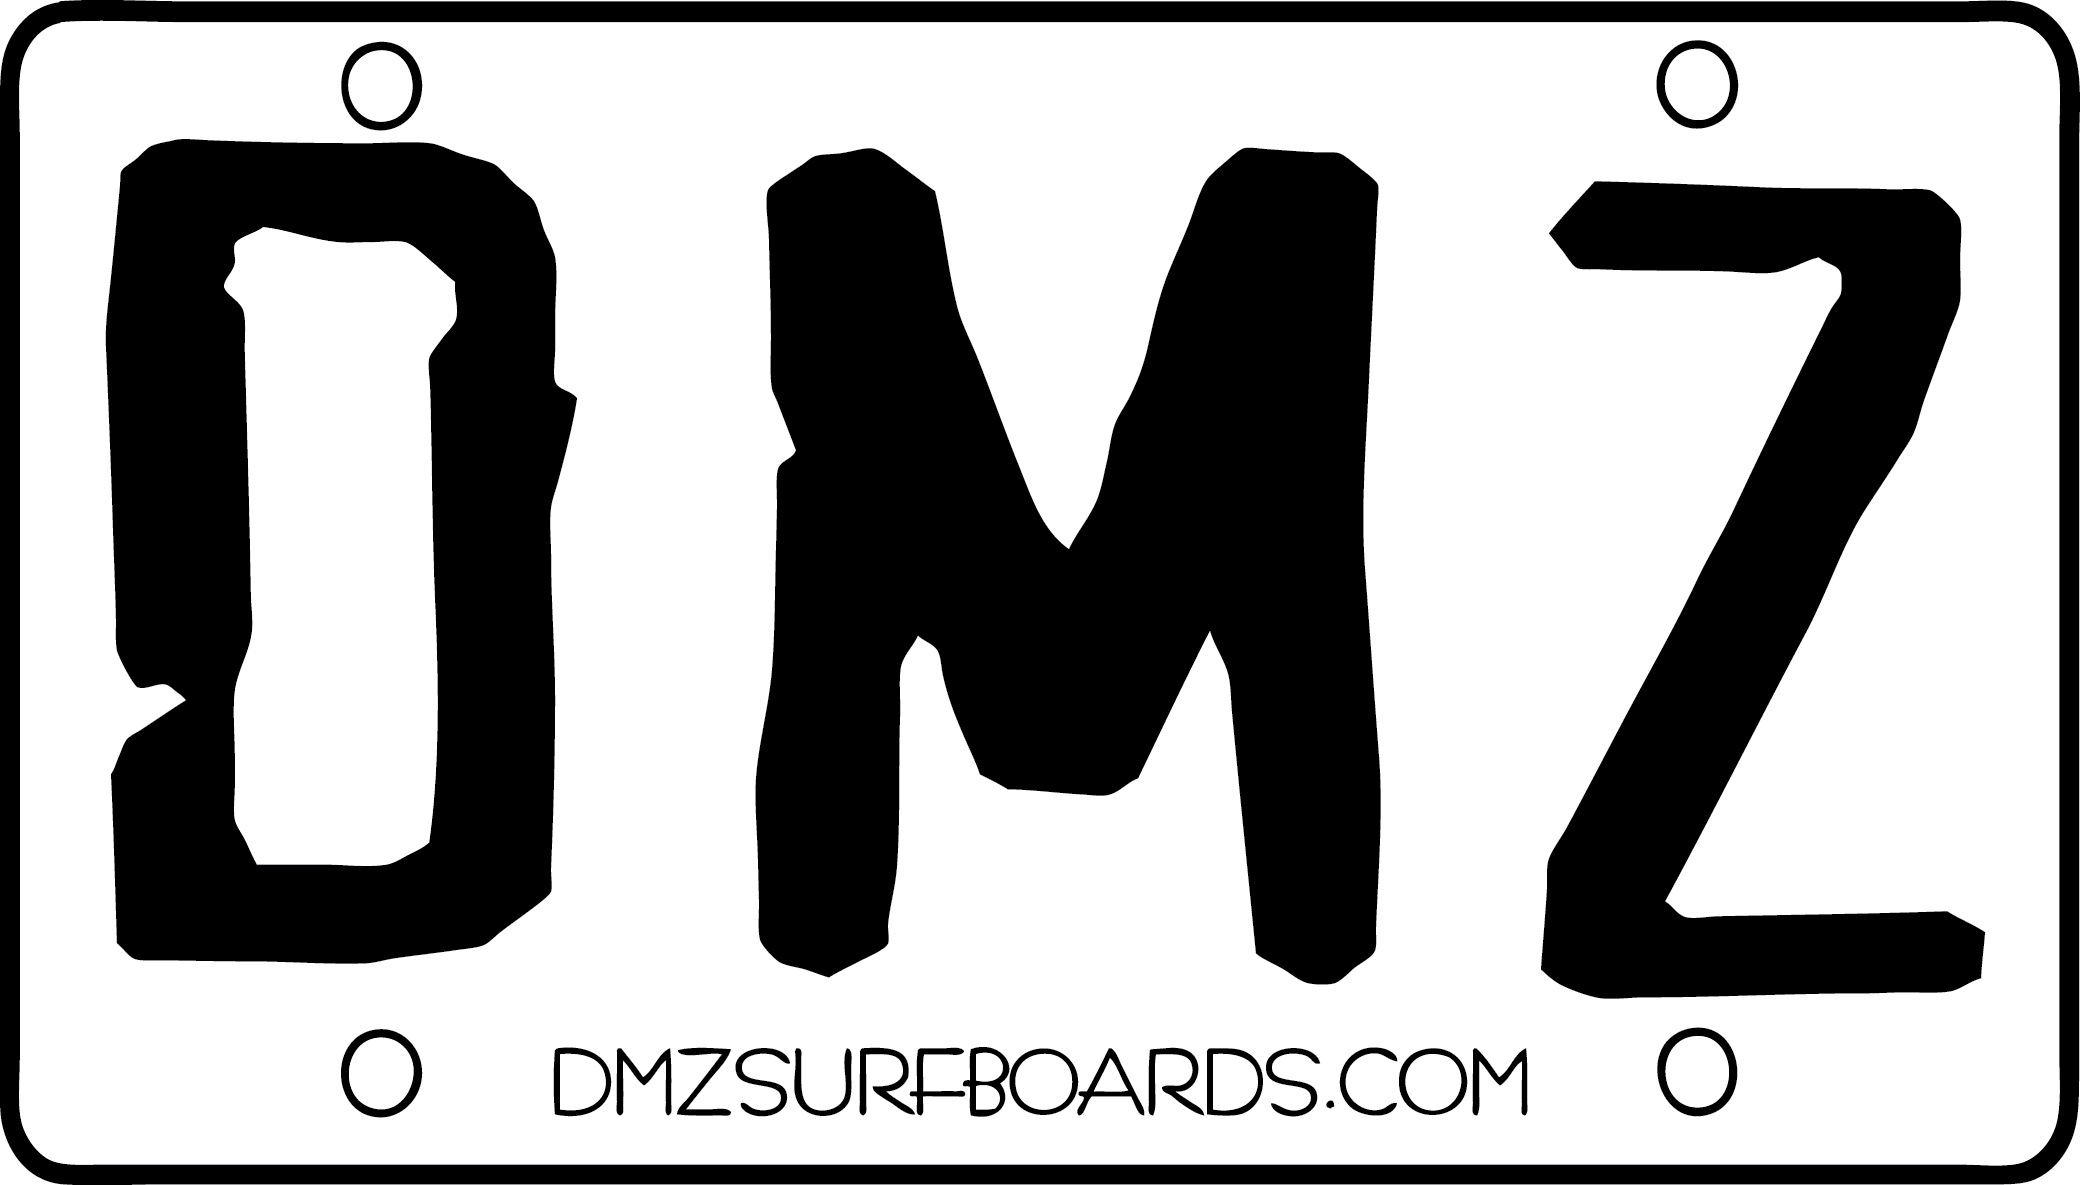 DMZ Surfboards